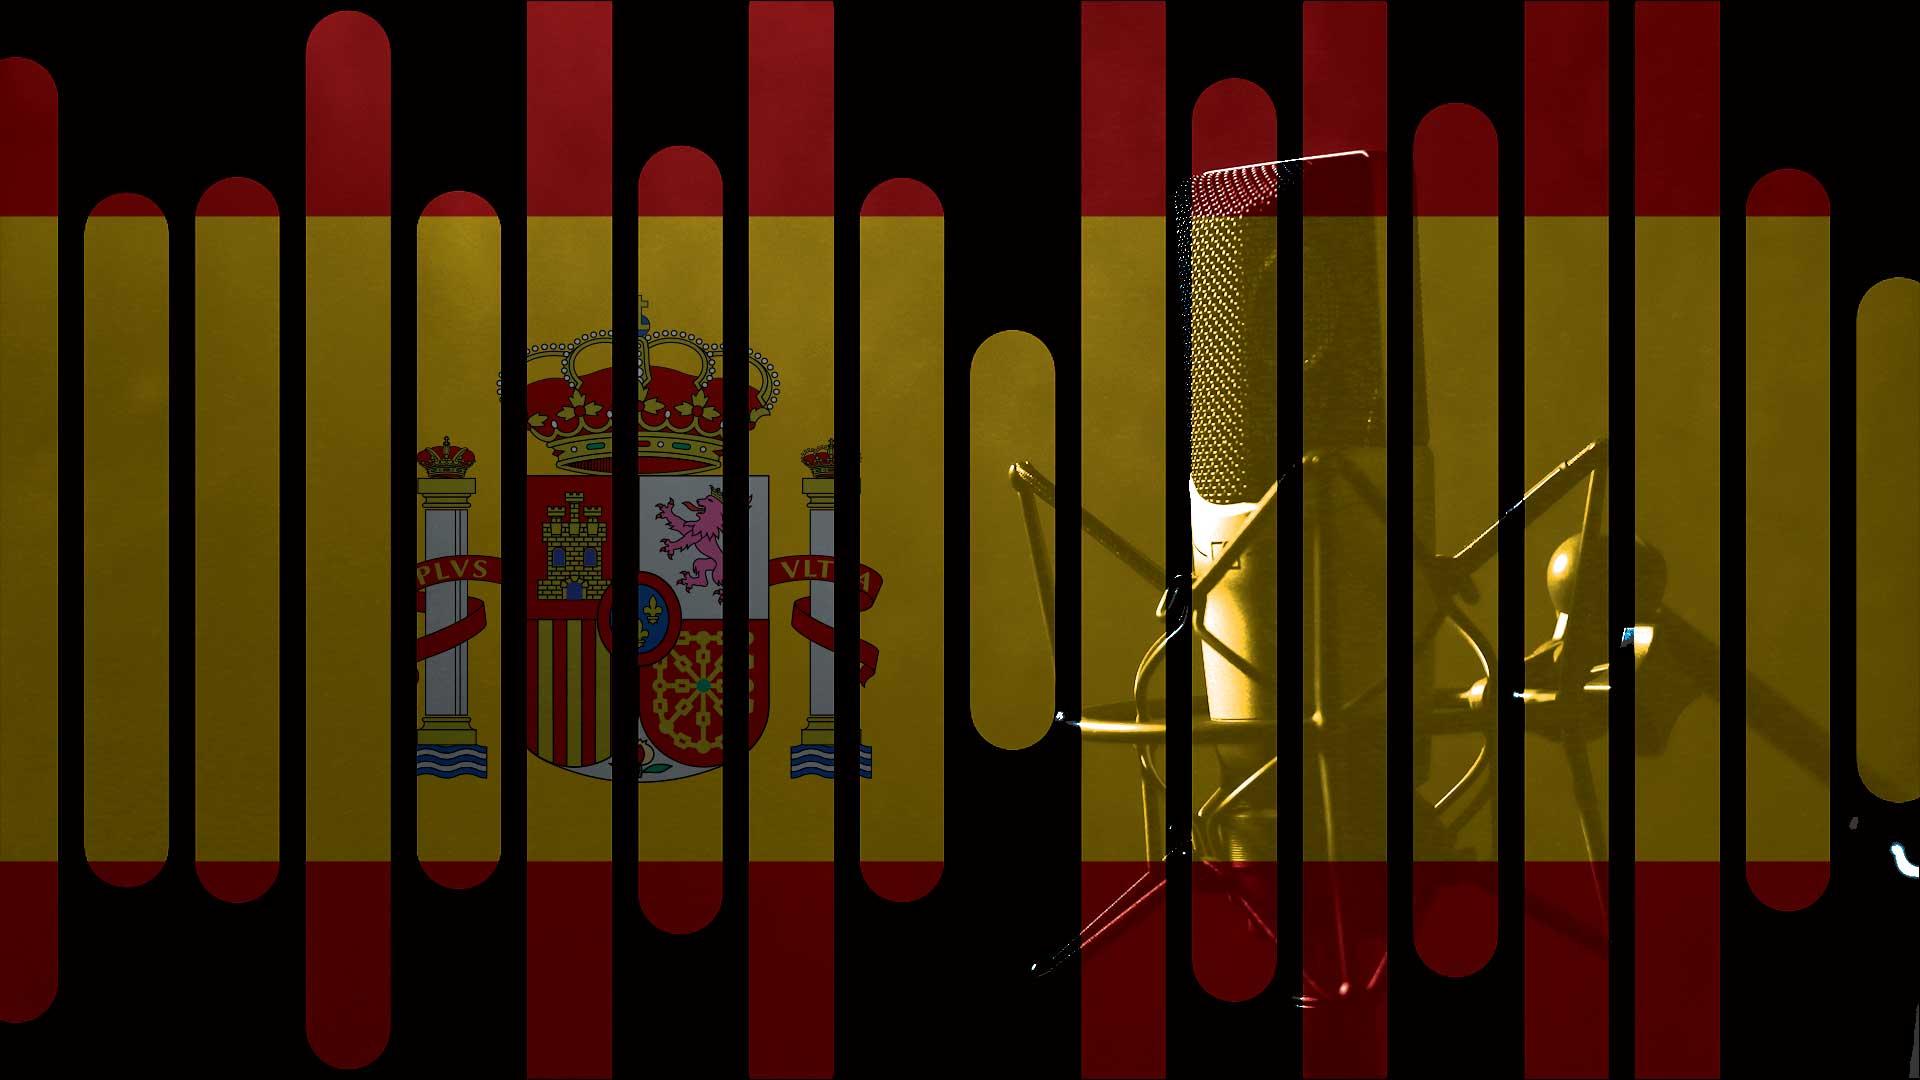 Voice-Over Services Spain - Voquent